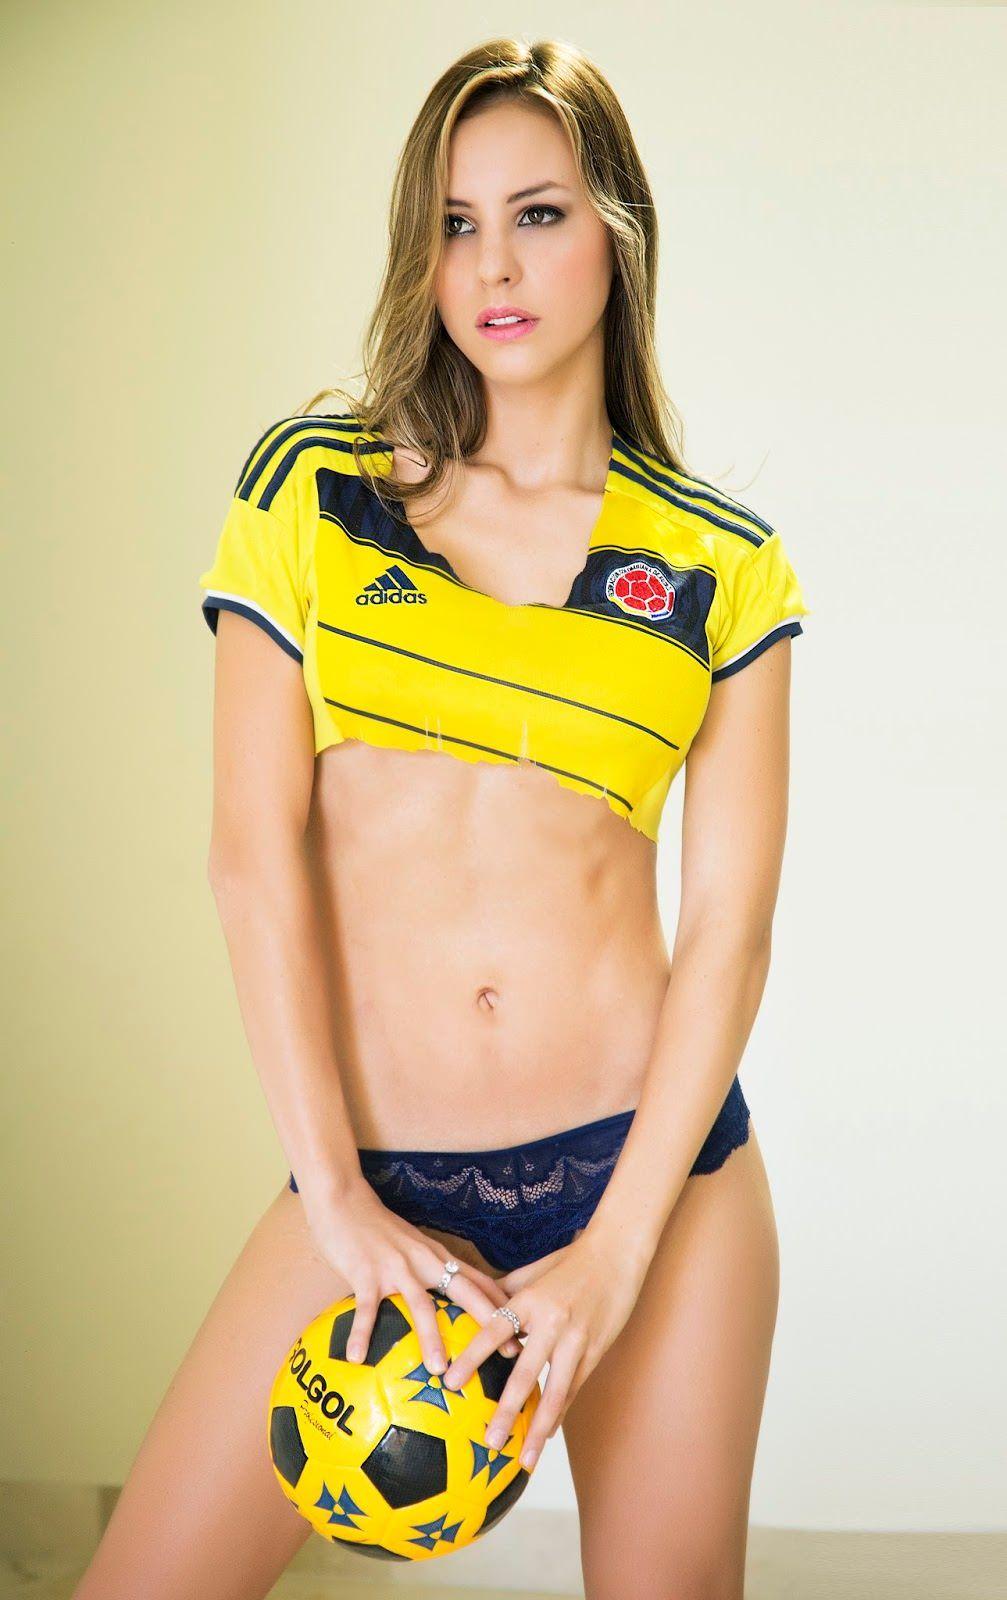 Hot Colombian Xxx Stunning anii-cardona-4 (1007×1600)   colombian girls models